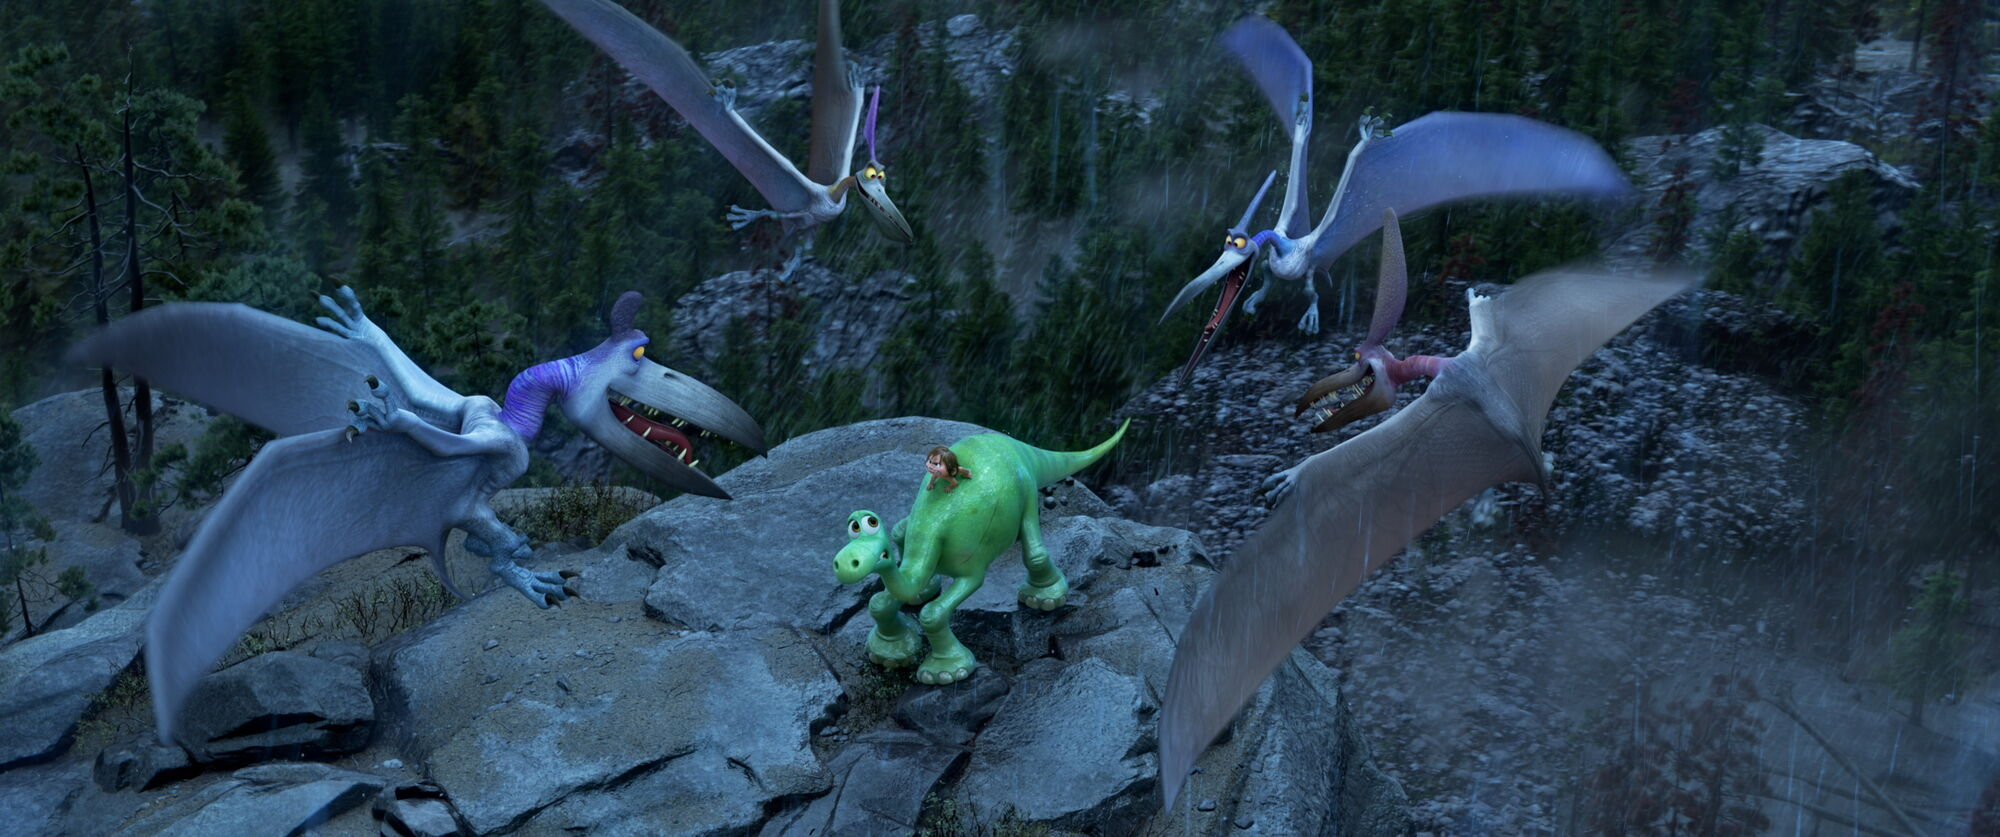 Triceratops The Good Dinosaur: Fandom Powered By Wikia